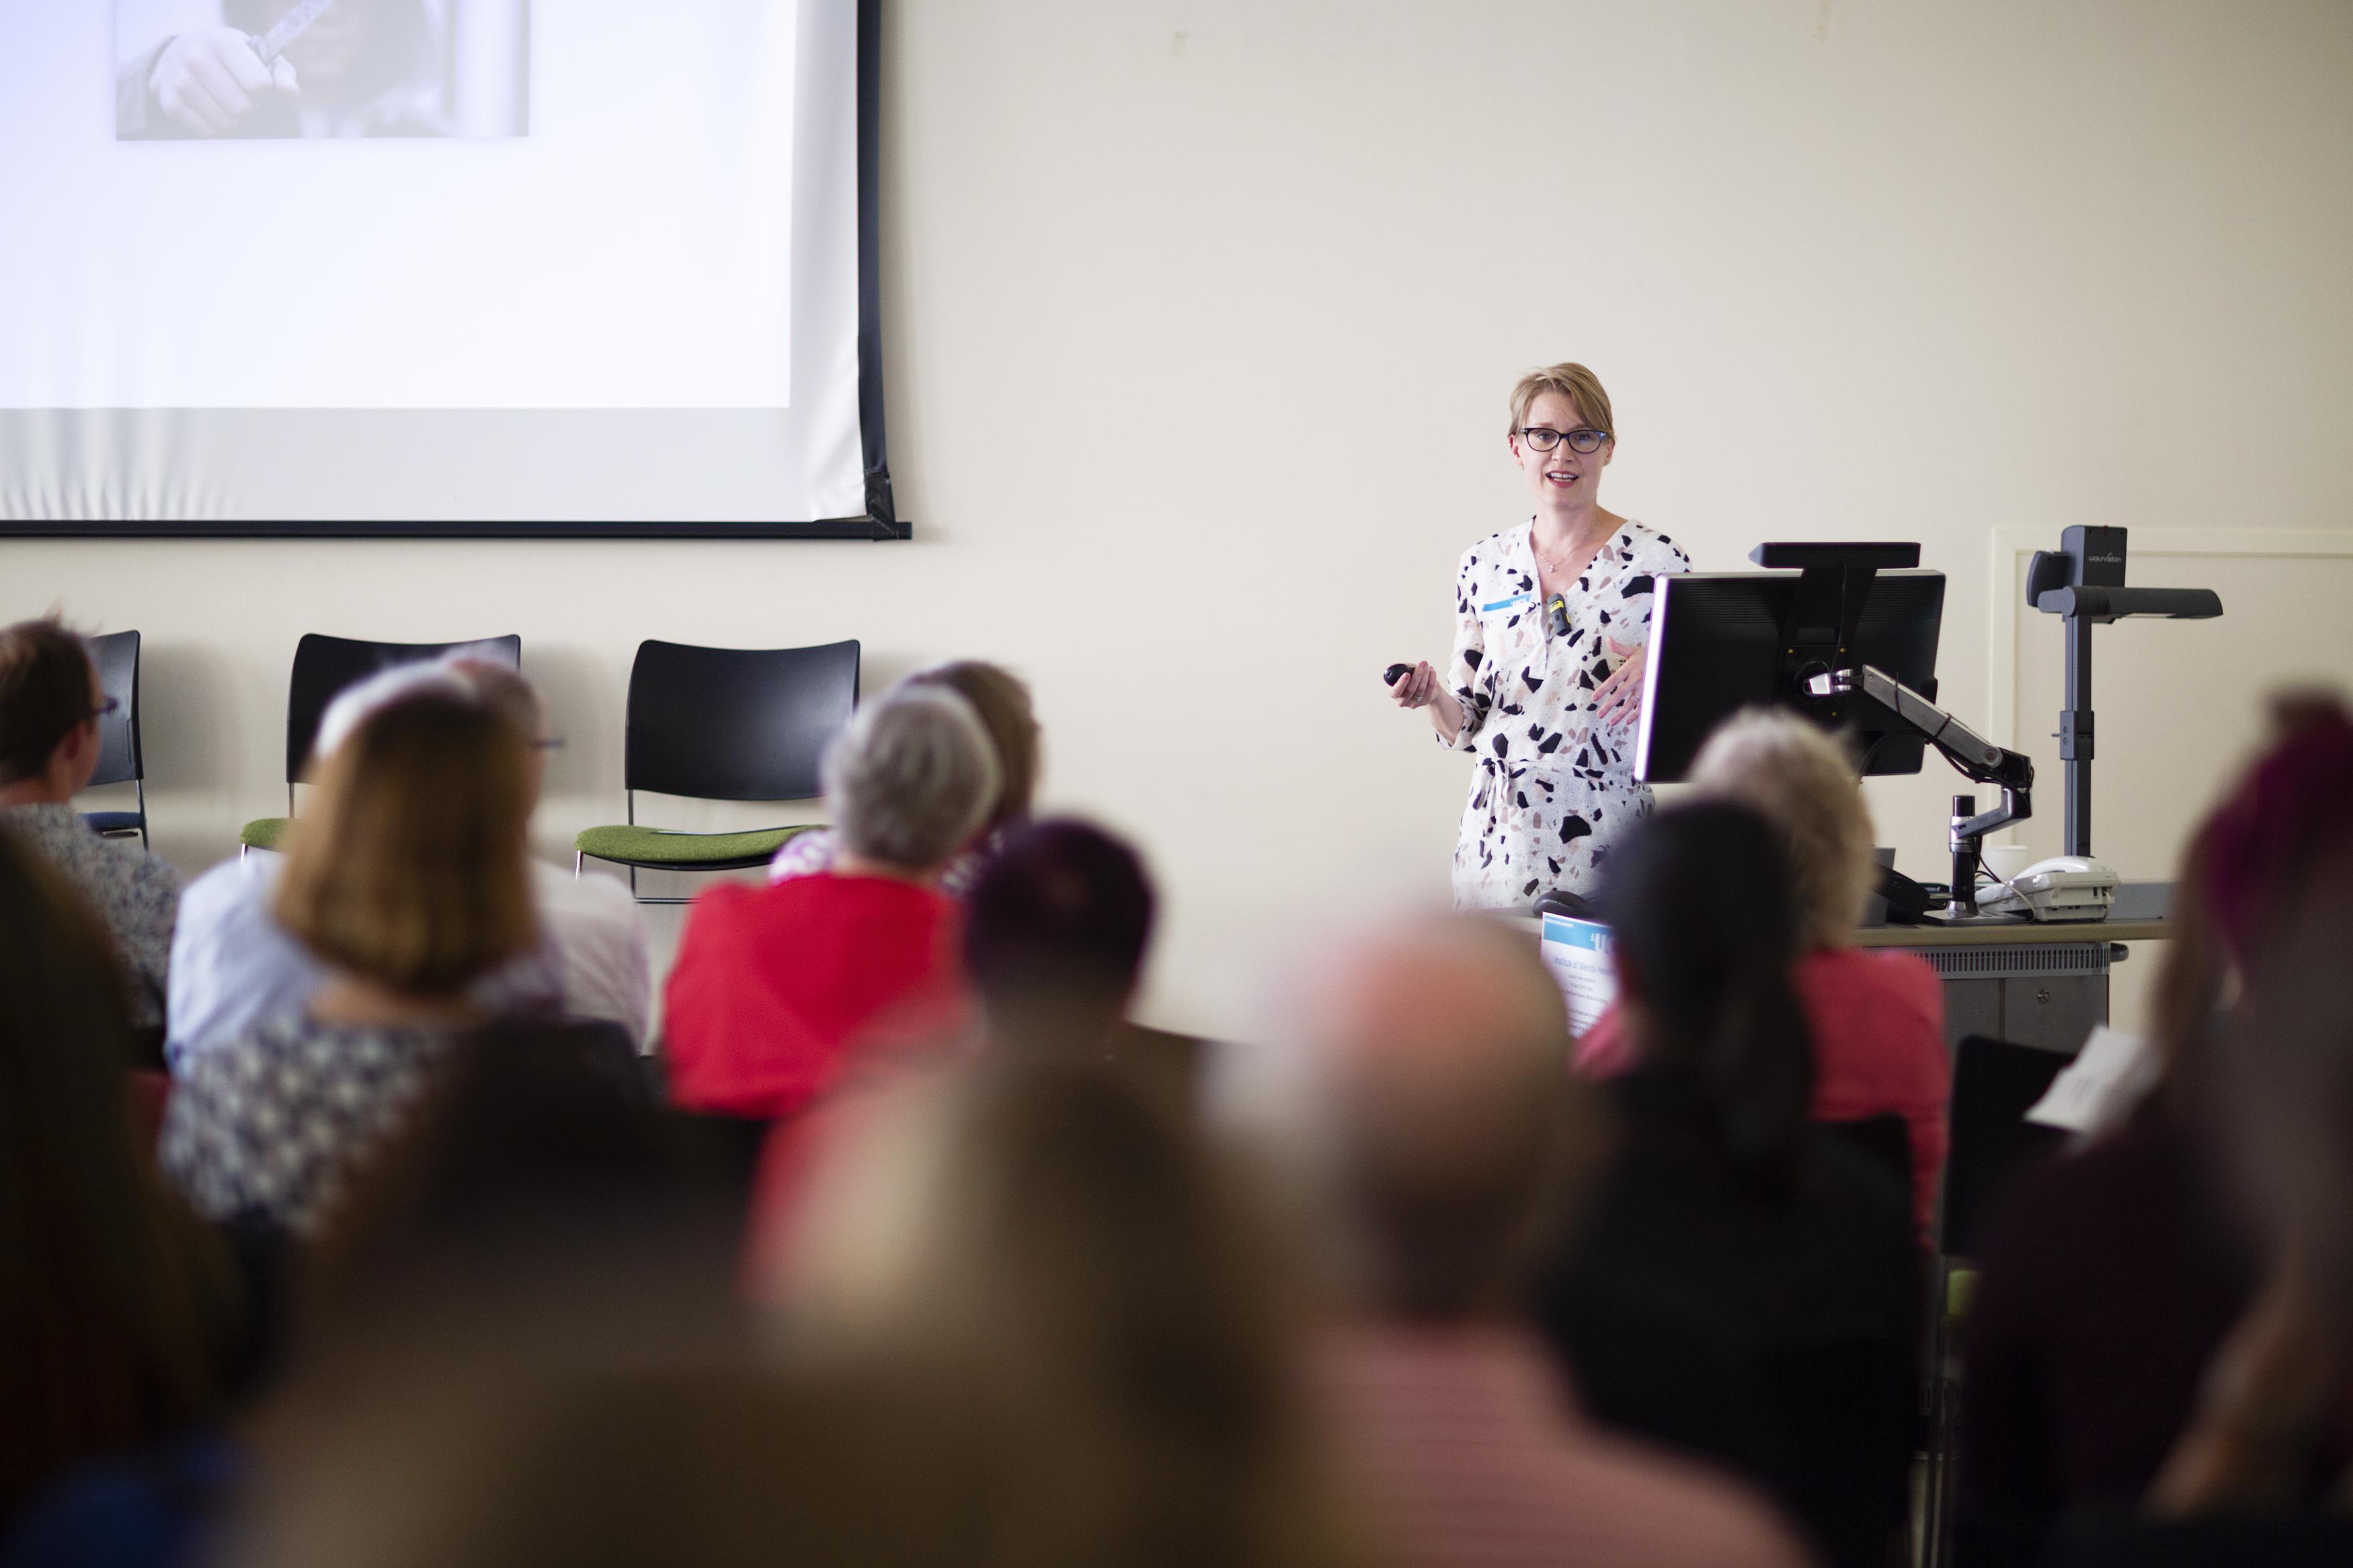 Essi Viding giving a presentation